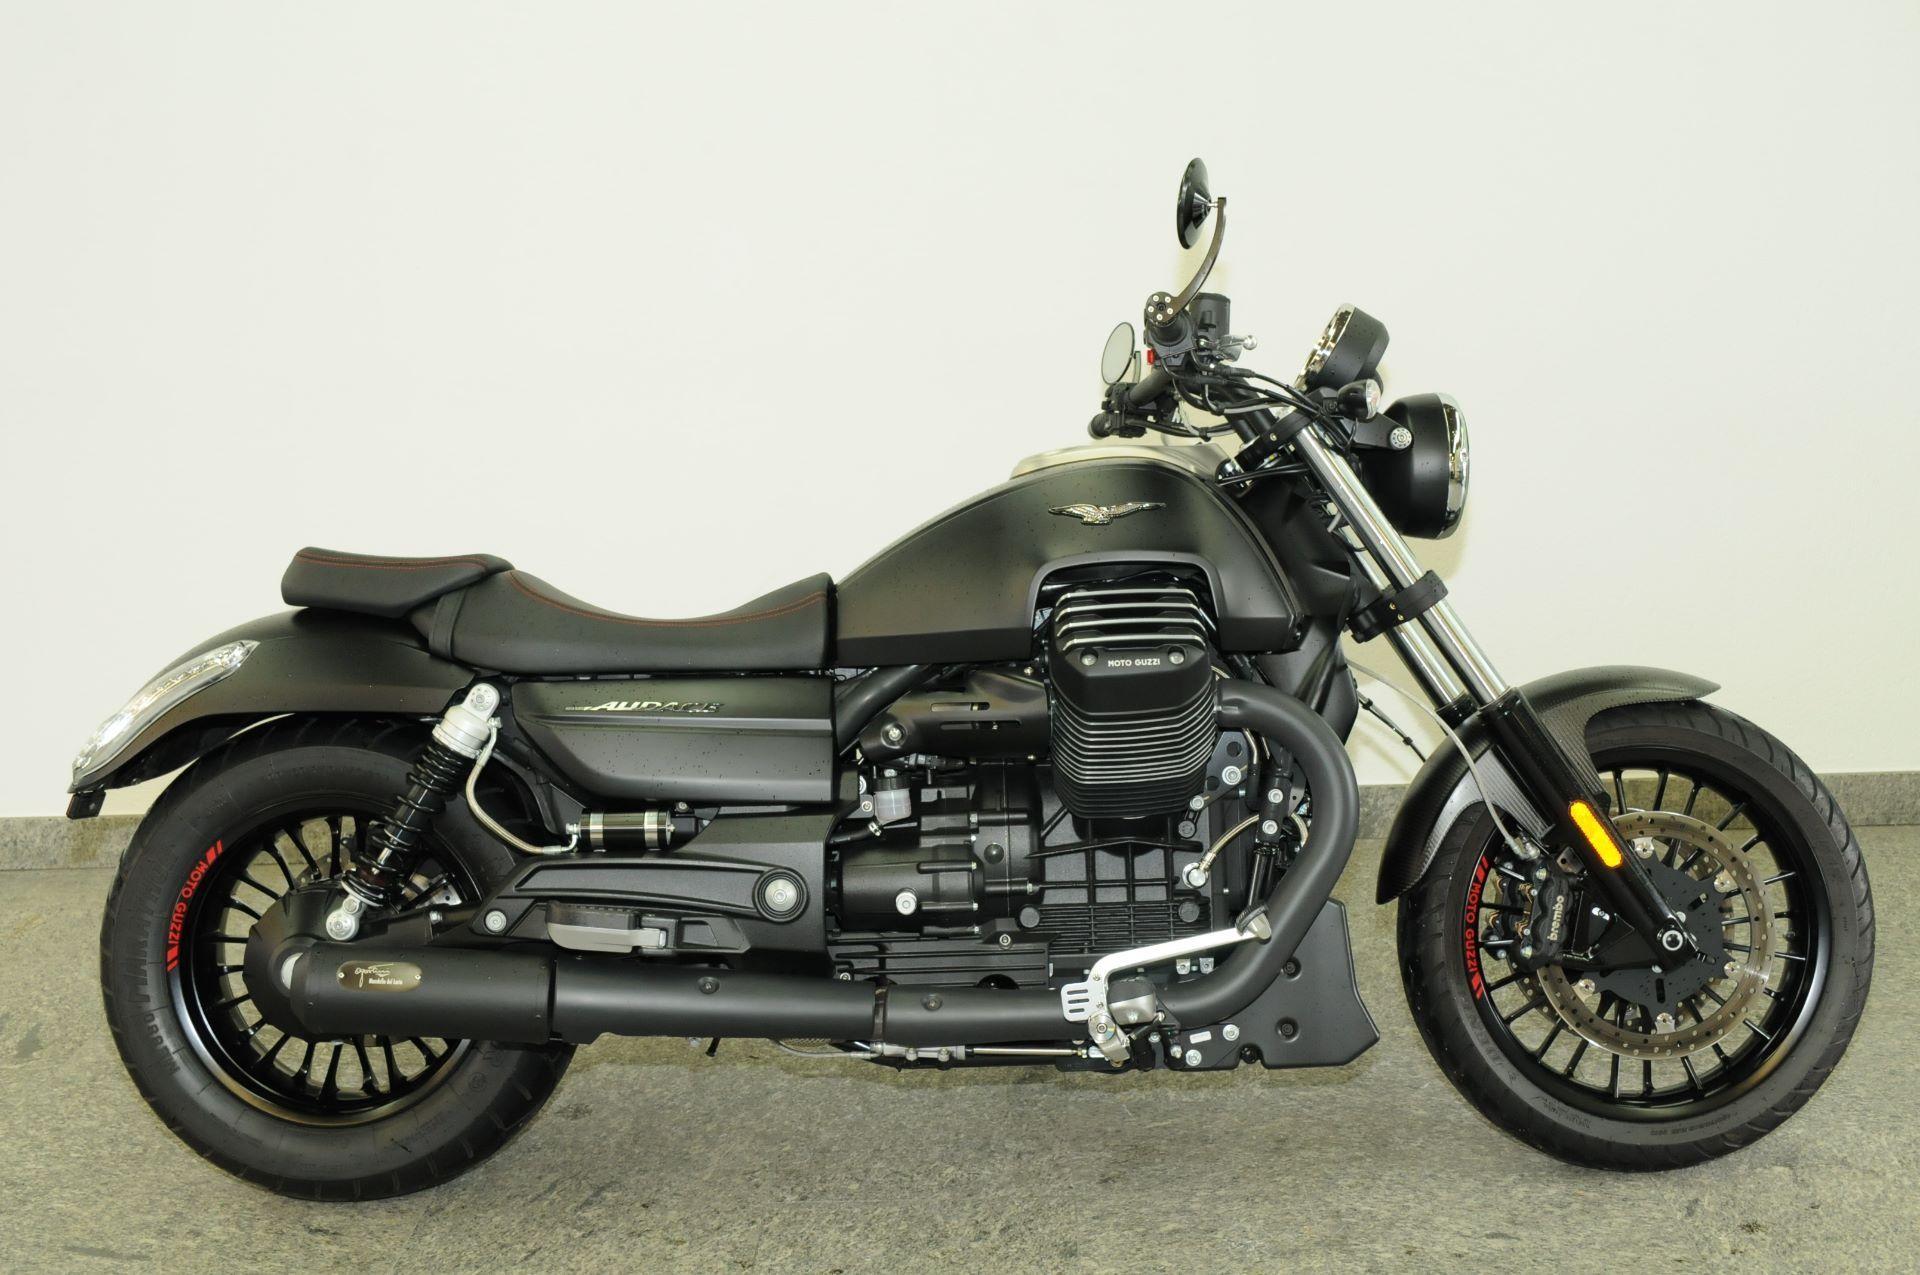 motorrad occasion kaufen moto guzzi audace 1400 abs. Black Bedroom Furniture Sets. Home Design Ideas